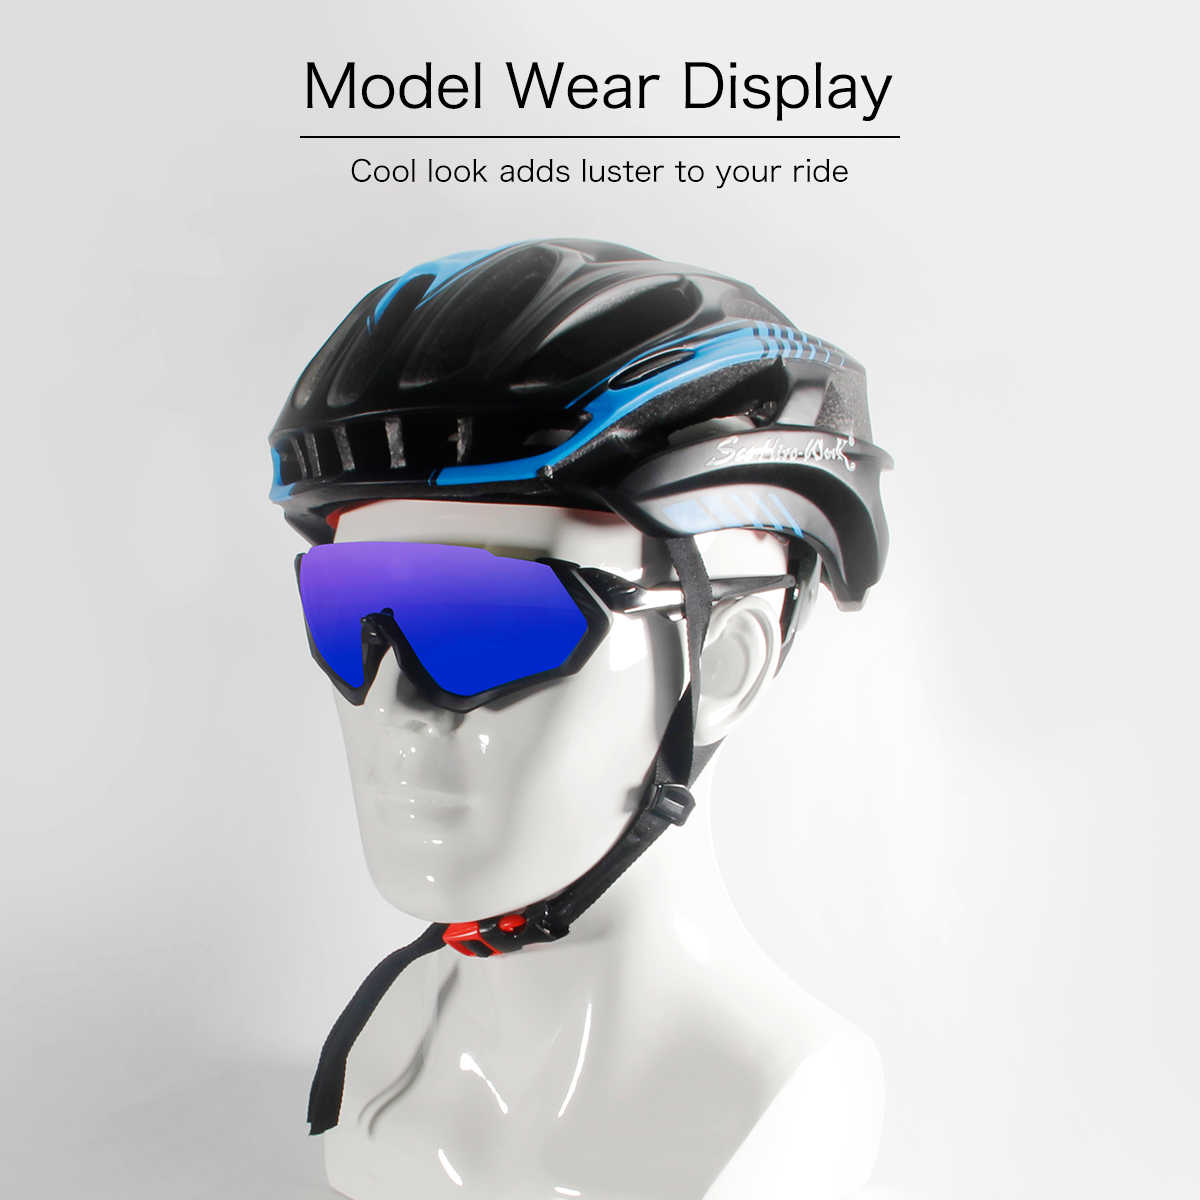 f668ed1879d ... Queshark Sport Sunglasses Mtb Cycling Glasses Bike Glasses Men Women Bicycle  Goggles Cycling Eyewear 3 Lens ...